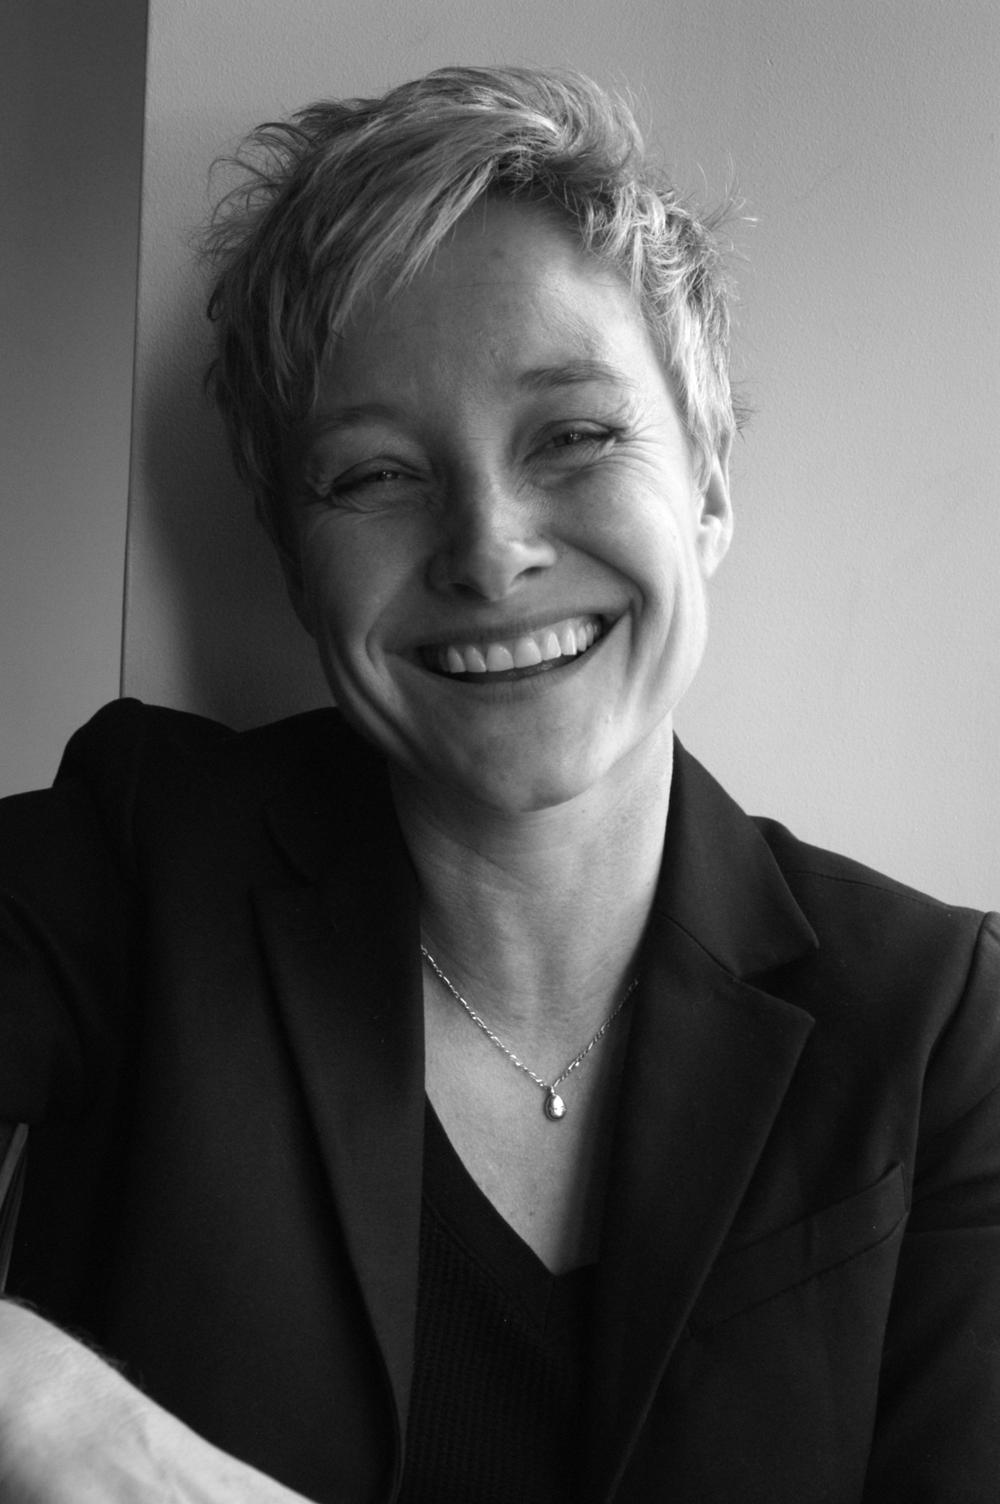 Anita Caprioli (born 1973)